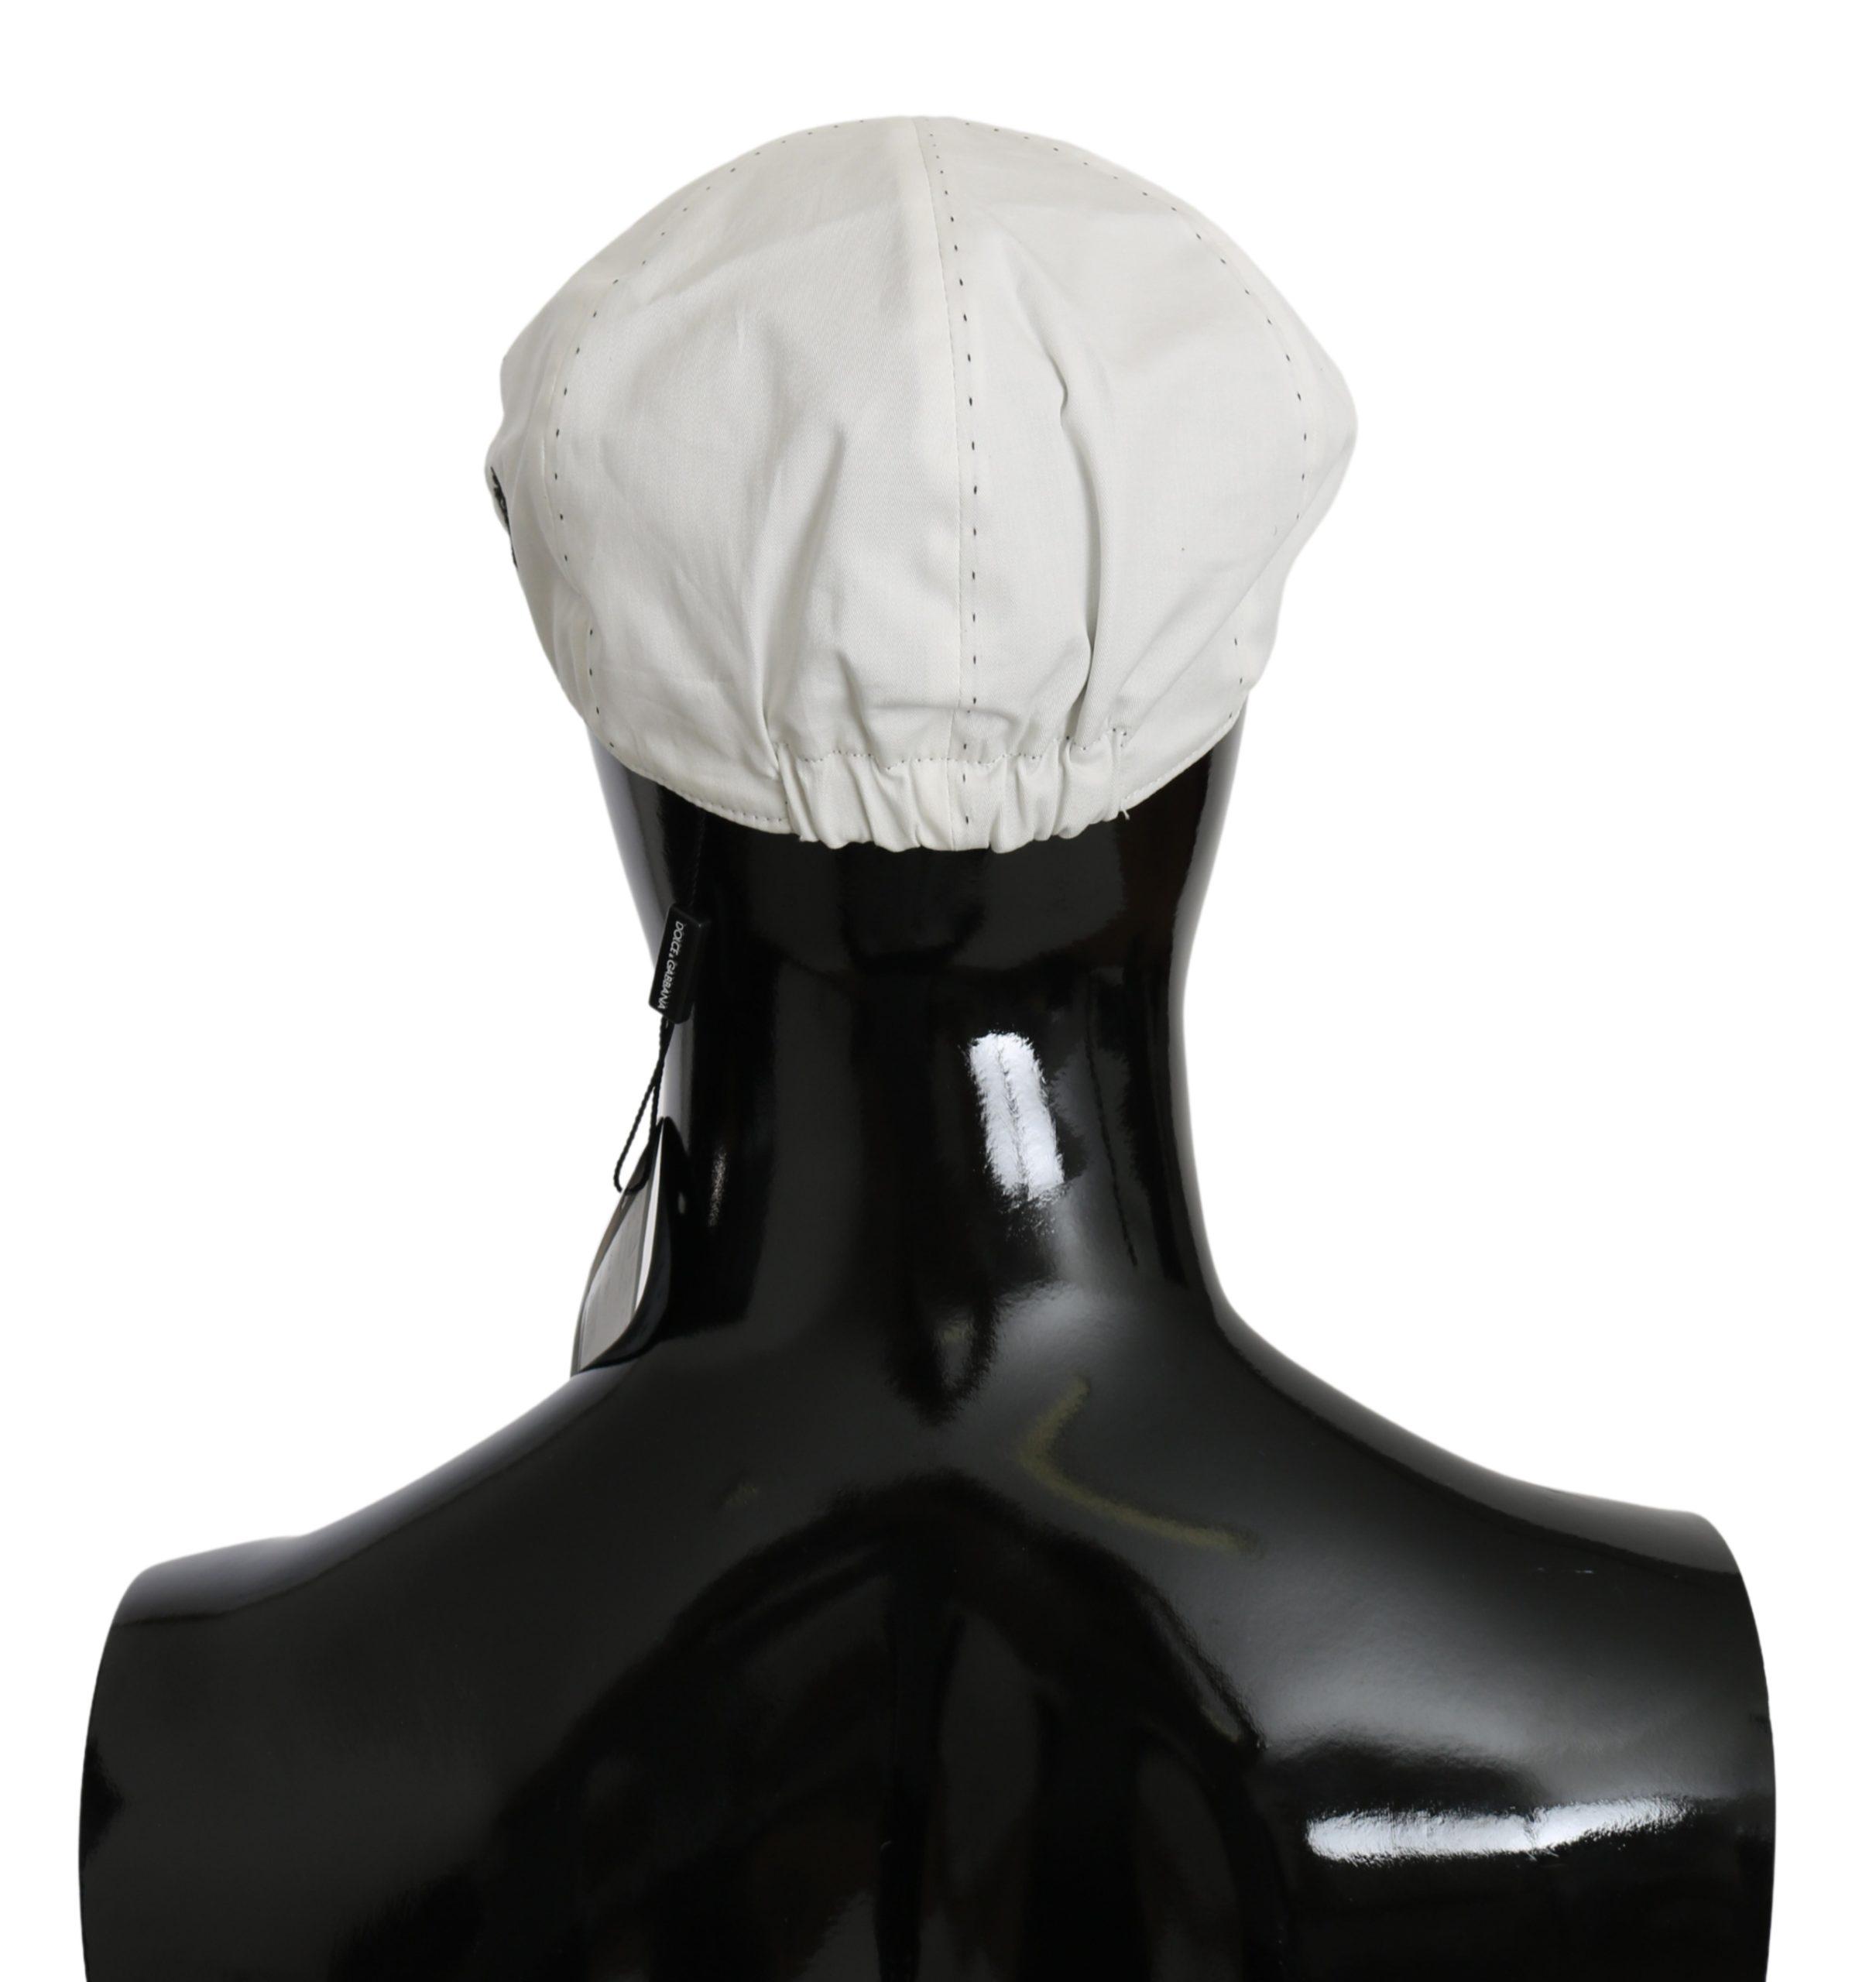 Dolce & Gabbana Men's Cotton Stretch Logo Hat White HAT9034 - 58 cm|M